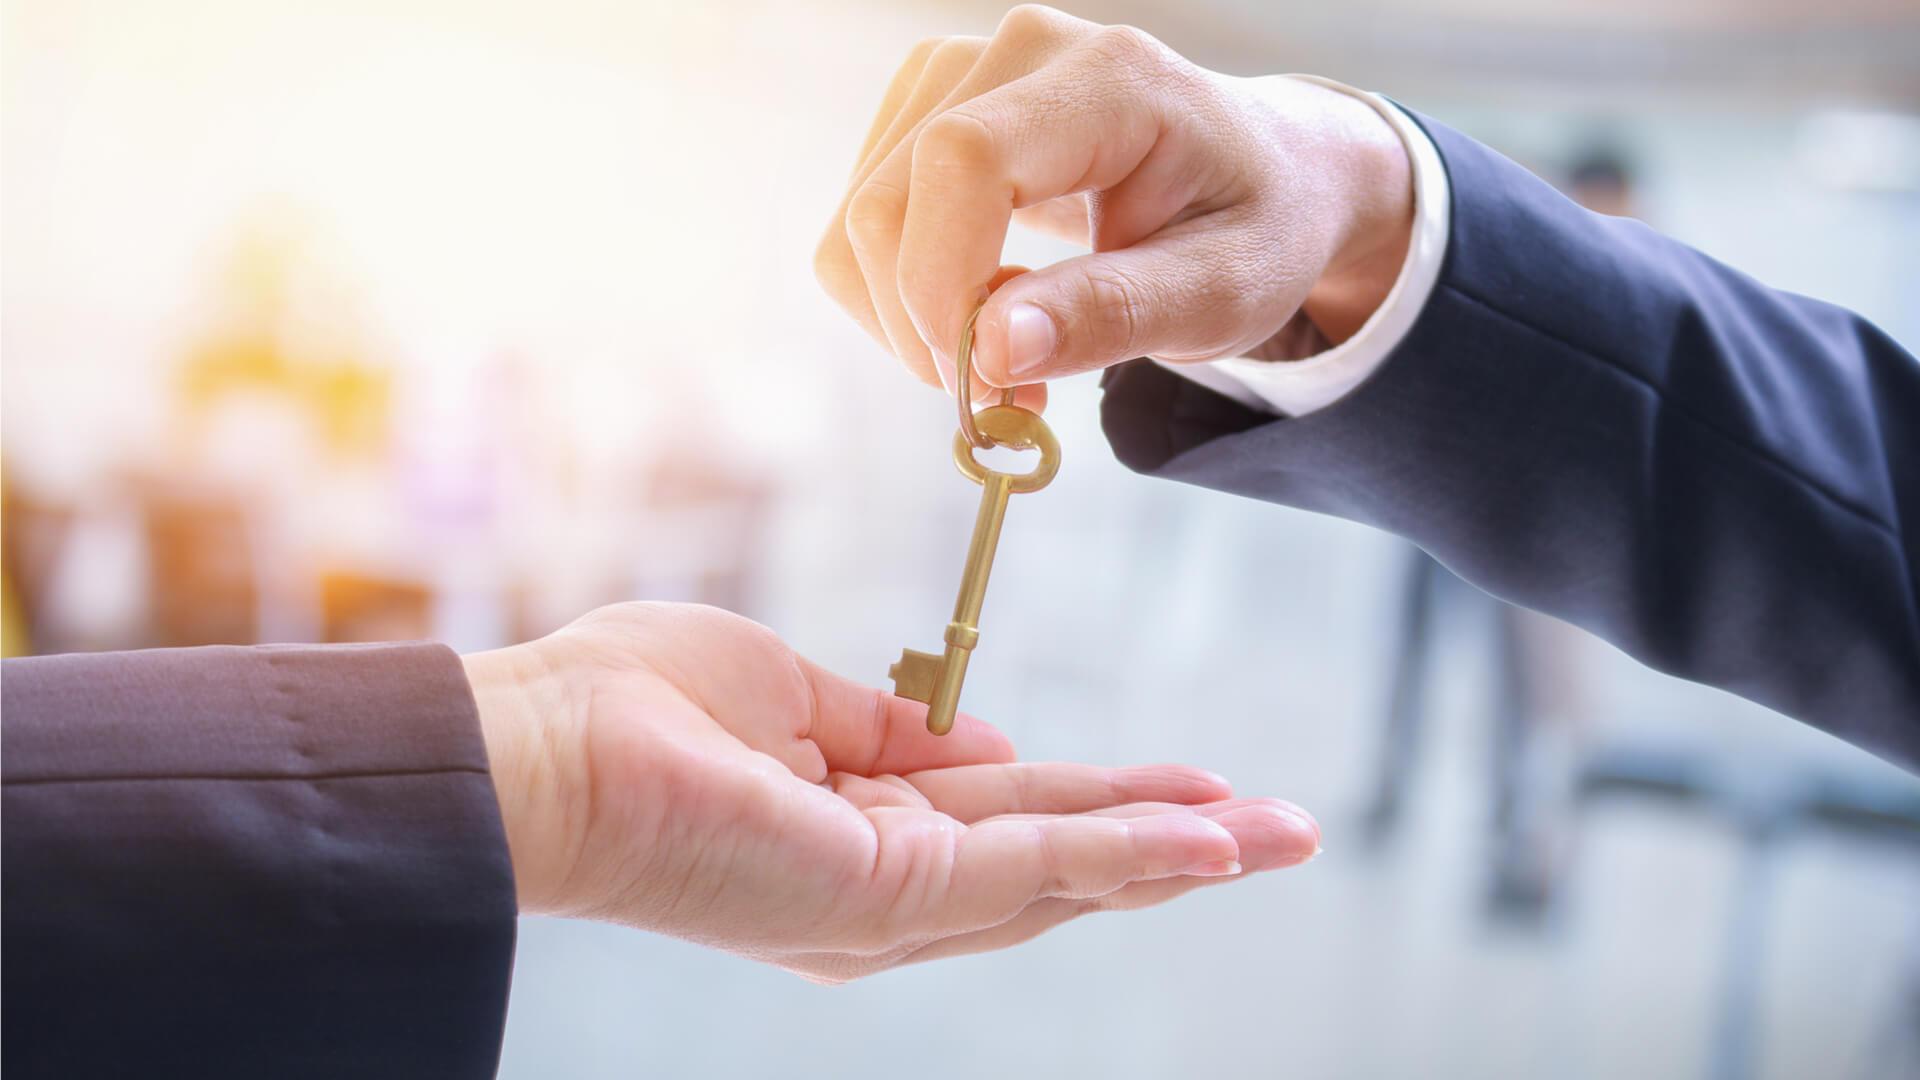 Advocate handing over a golden key